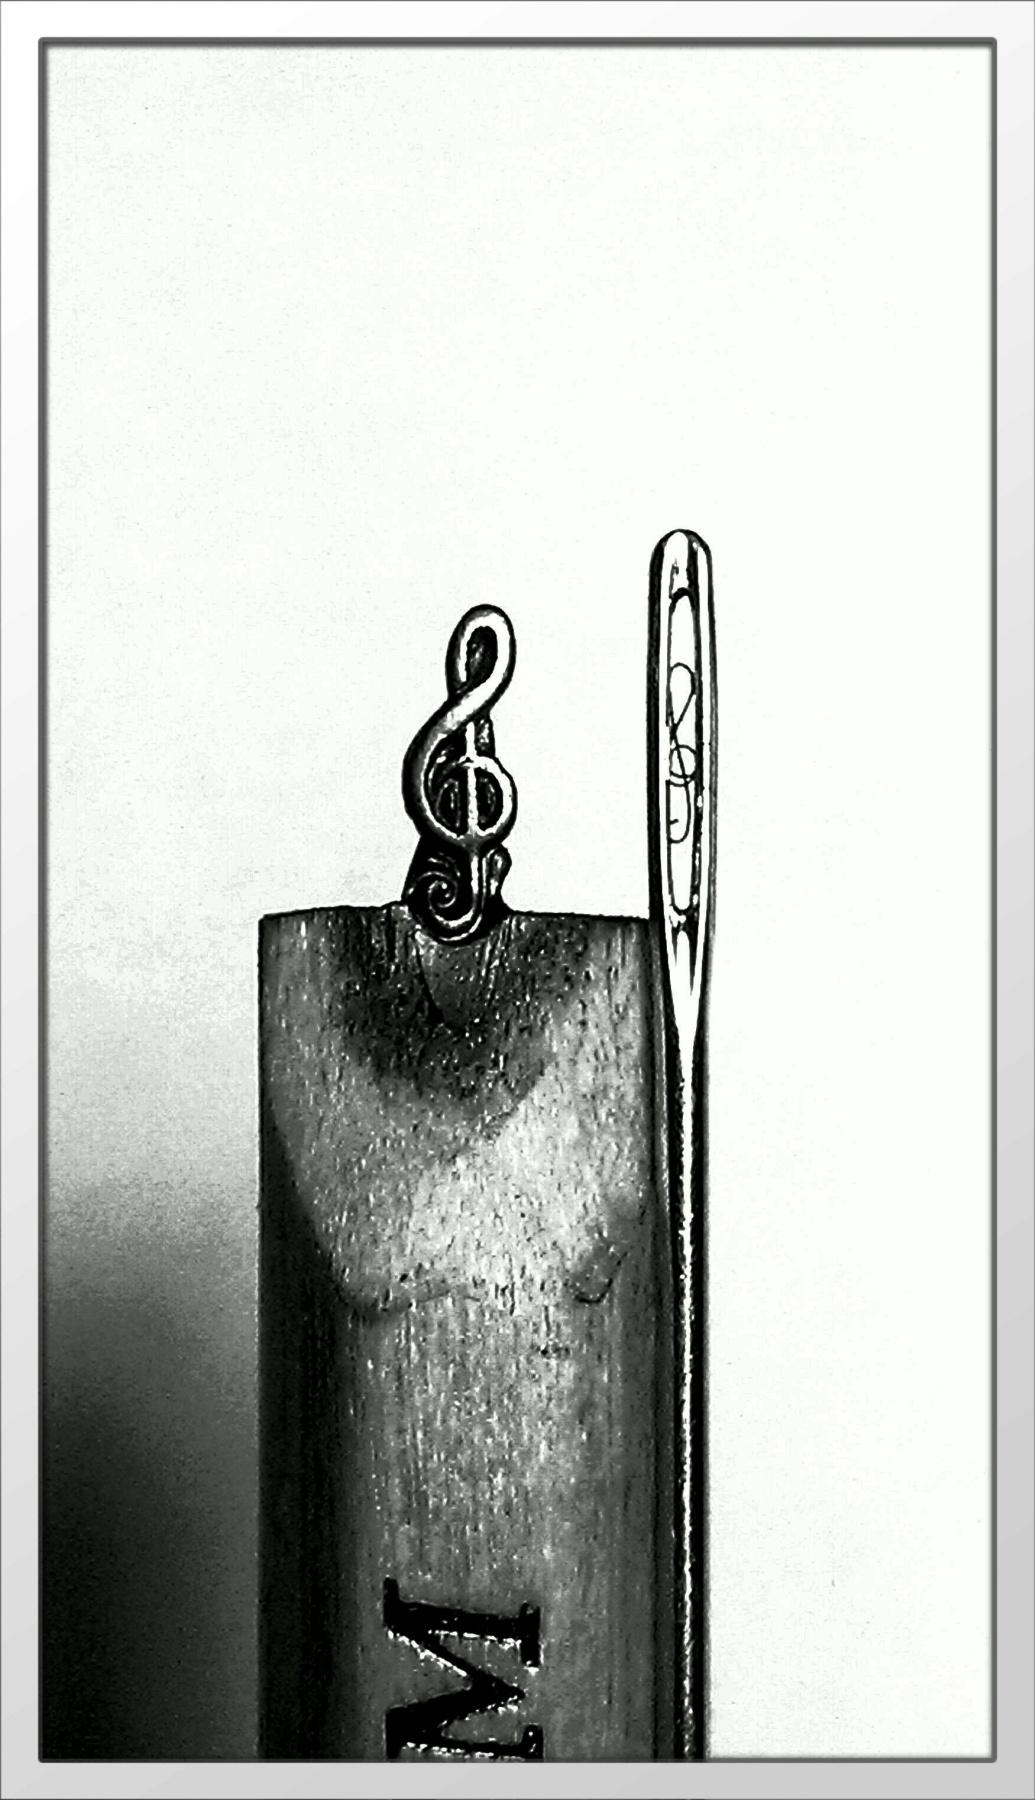 Krbtv _dm. Treble clefs.